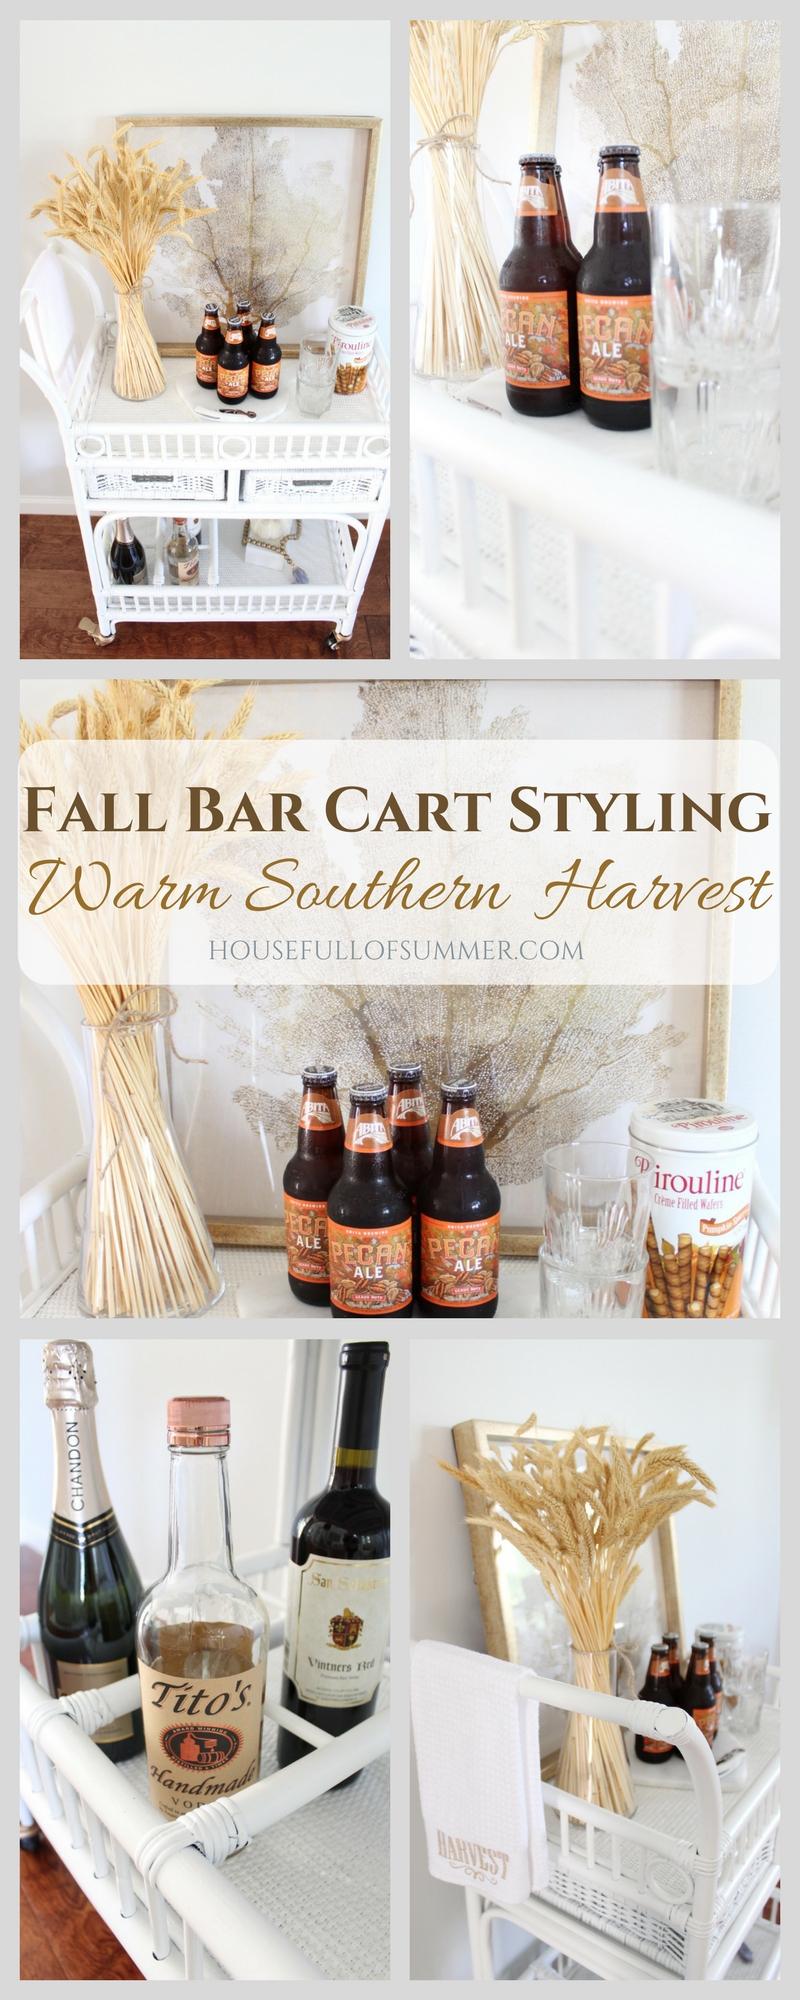 Bar Cart Styling - Warm Southern Harvest | bar cart makeover, fall bar cart ideas, southern fall decor, simple fall decor, bar cart styling tips, thanksgiving bar cart,